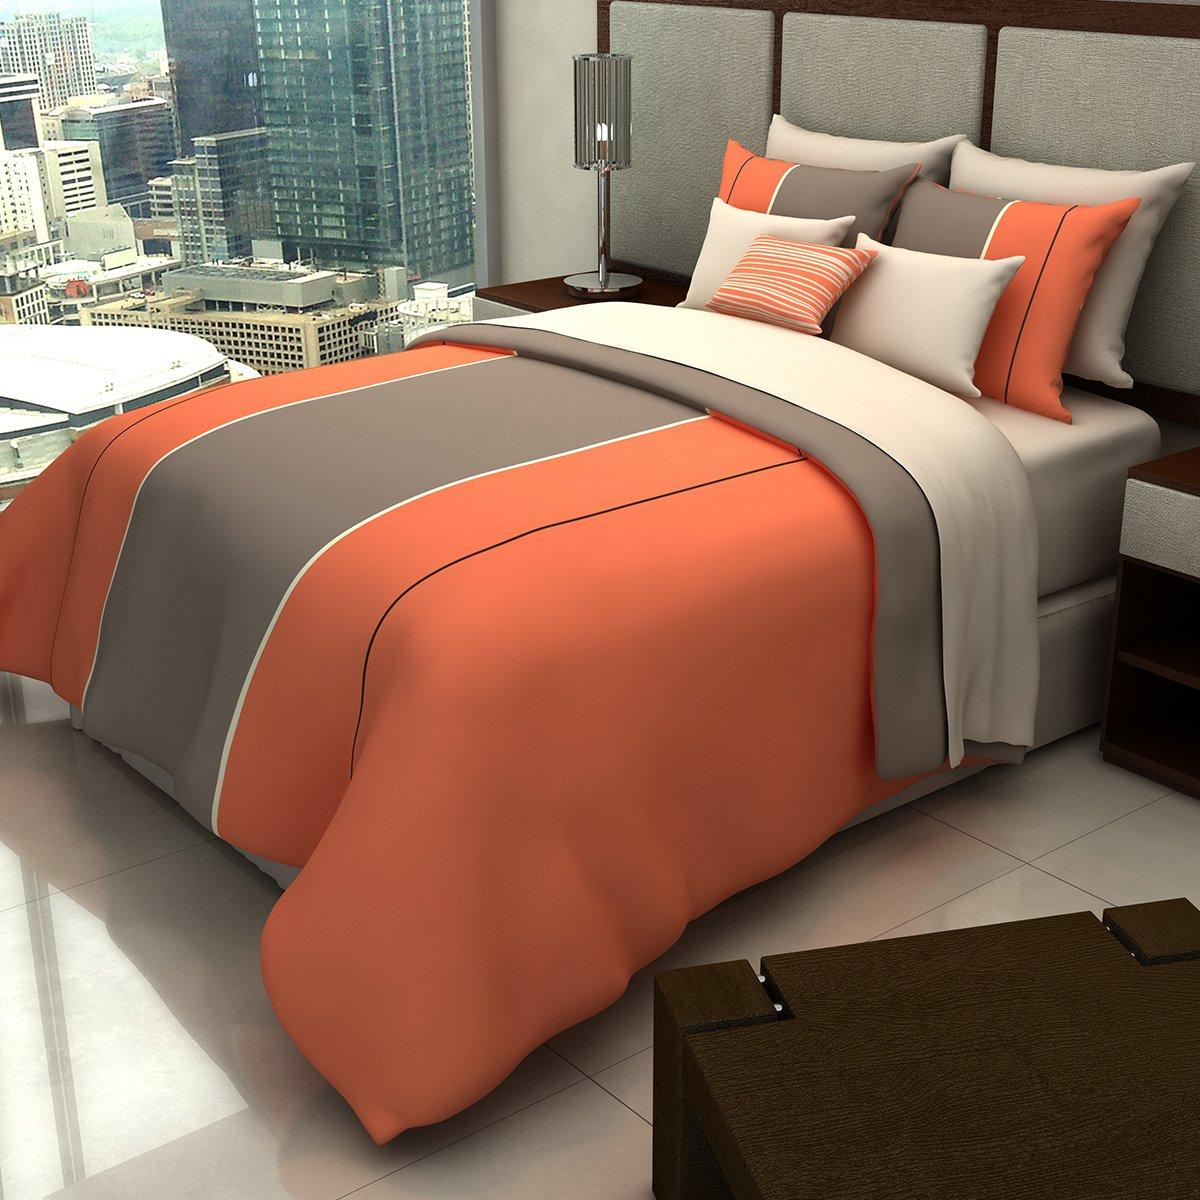 Paquete de cama matrimonial queen size pek n sears com for Imagenes de cama queen size